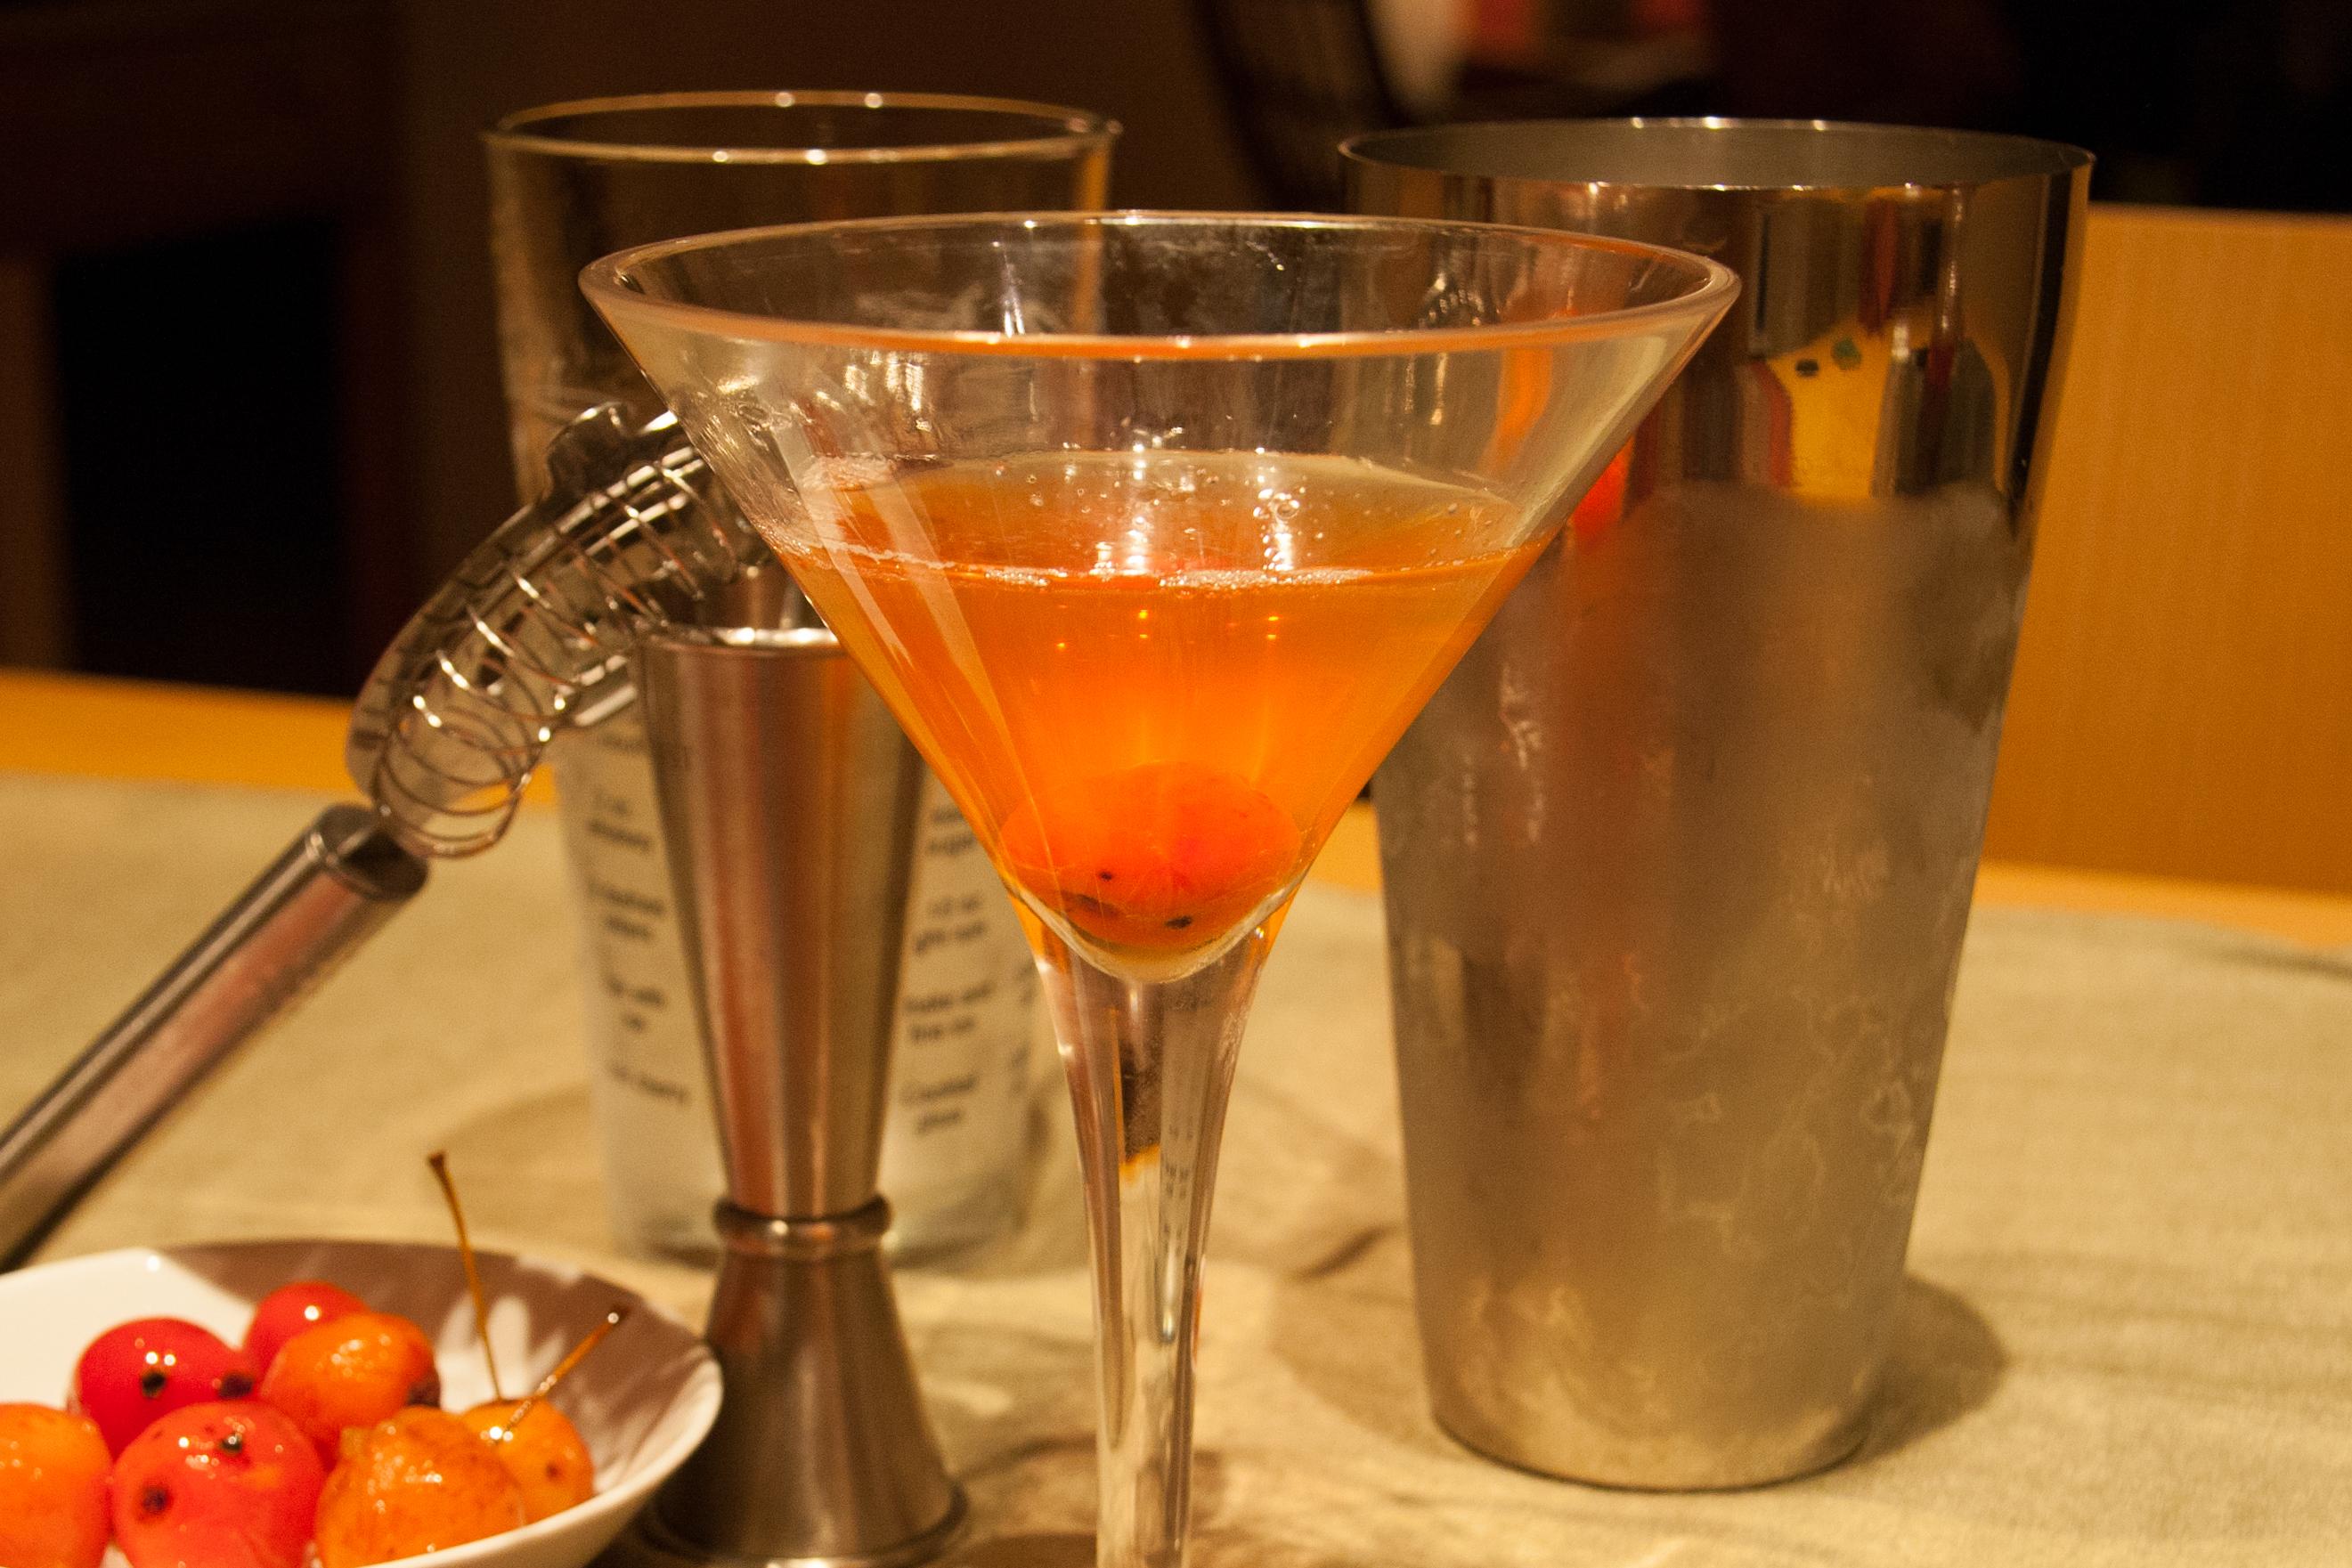 Crabapples & Bourbon: The Kentucky Belle Cocktail